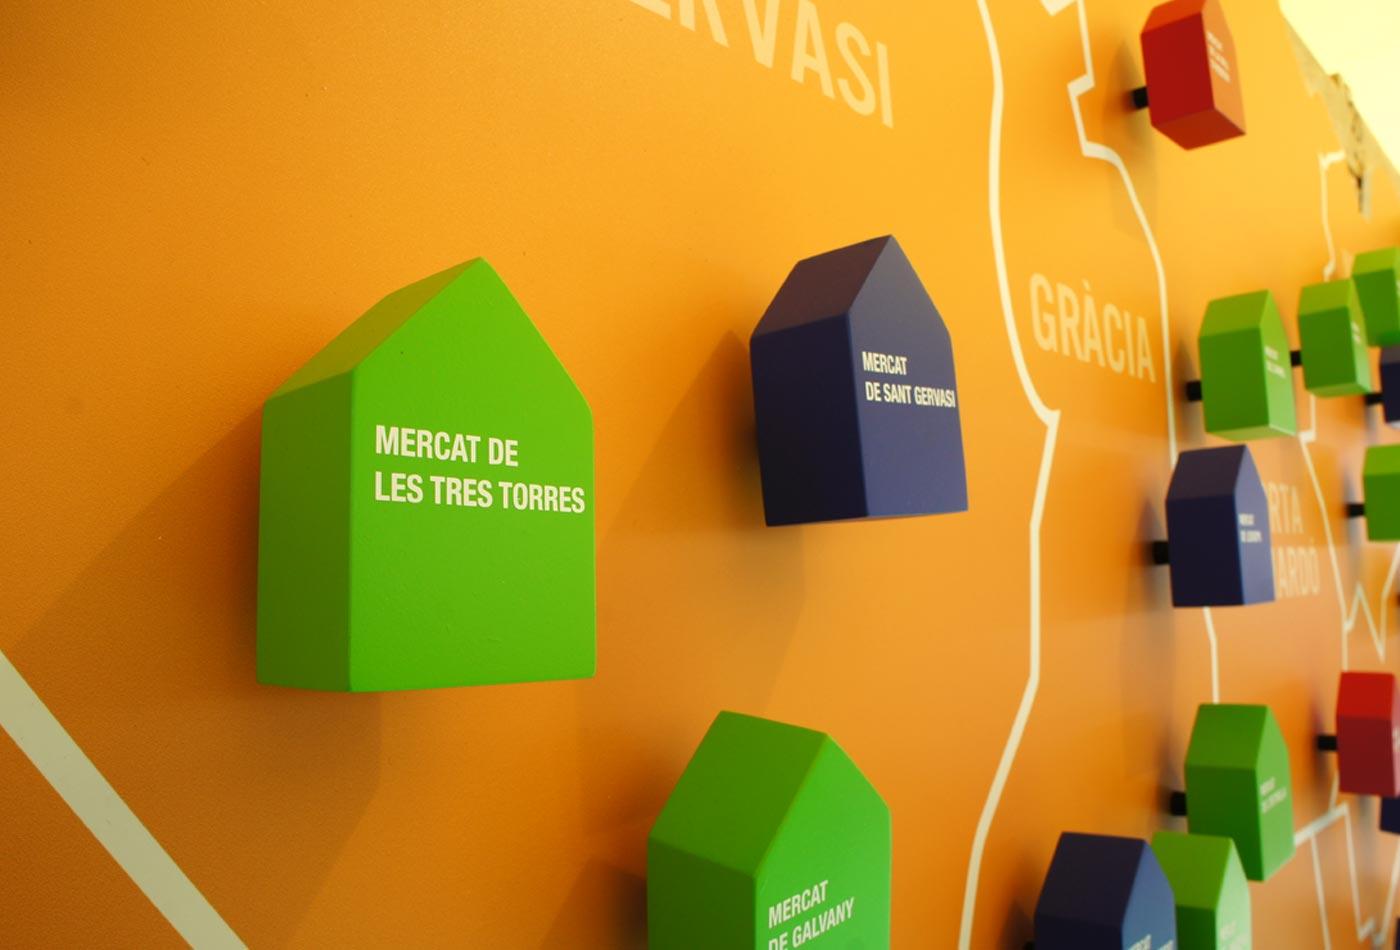 disseny-espai-promocio-mercats-barcelona